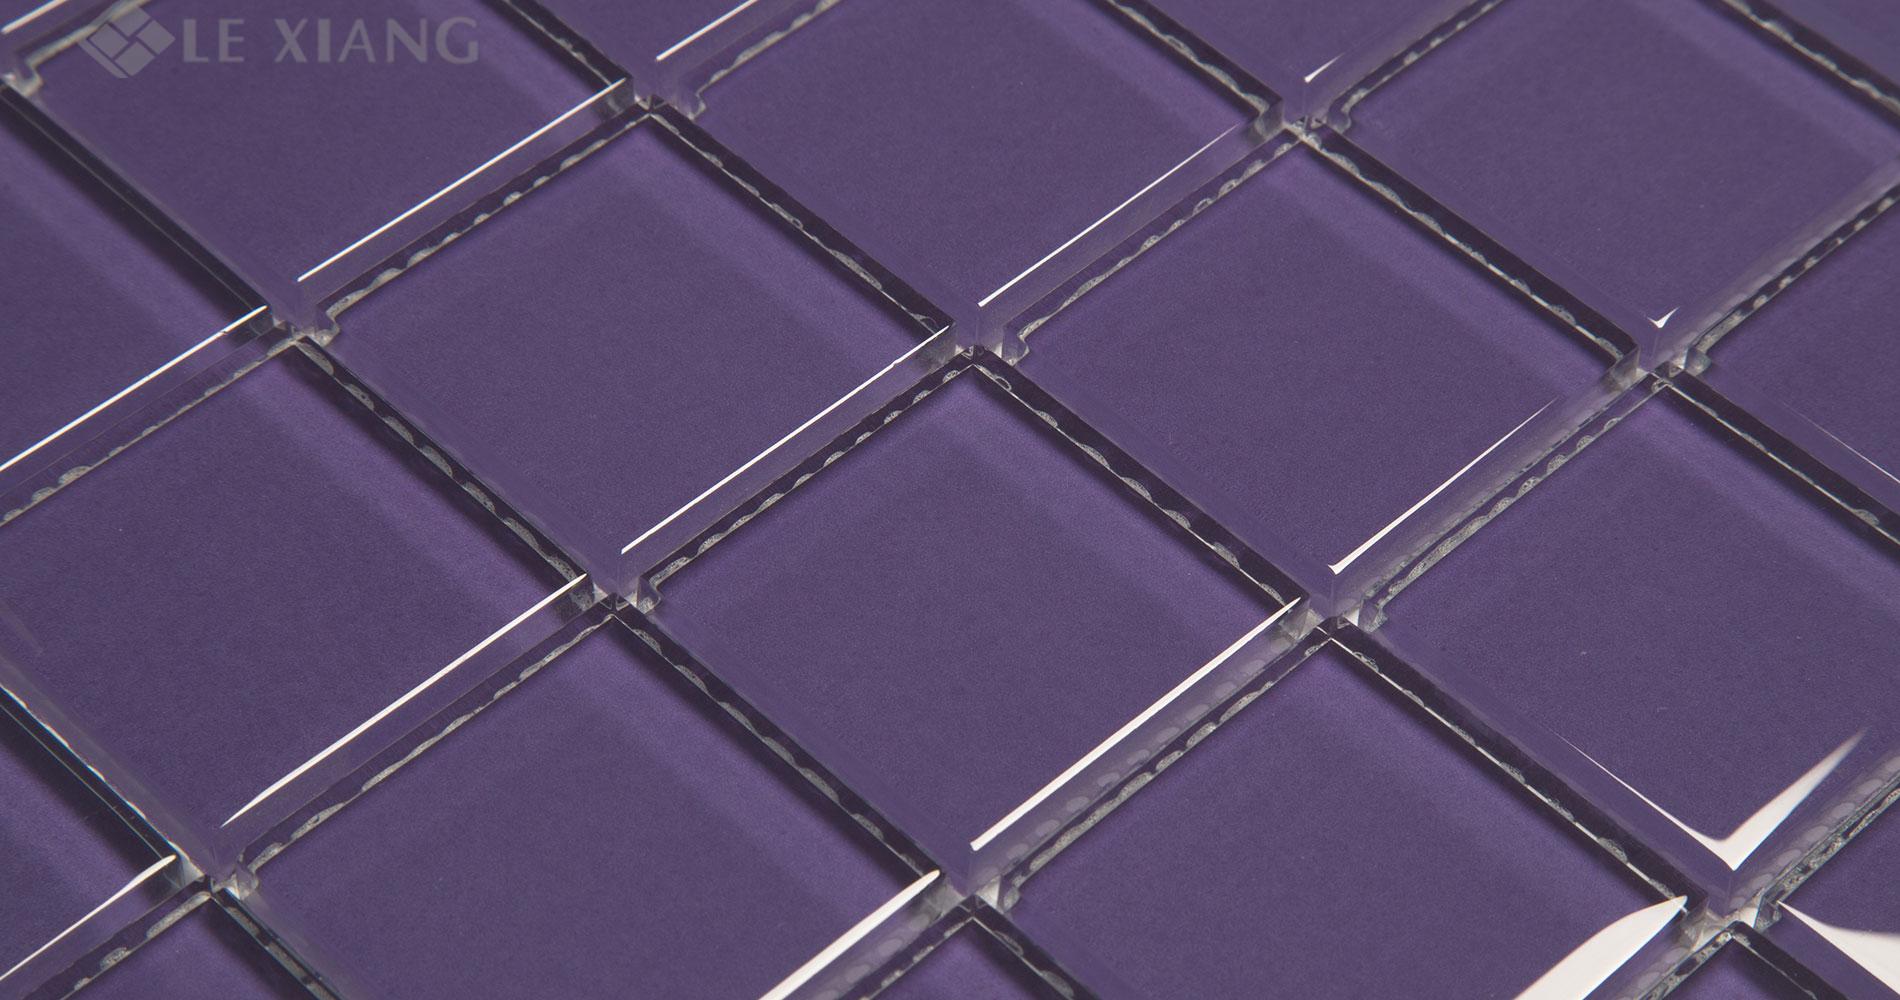 48mm-Square-Crystal-Glass-Mosaic-Backsplash-Tiles-15